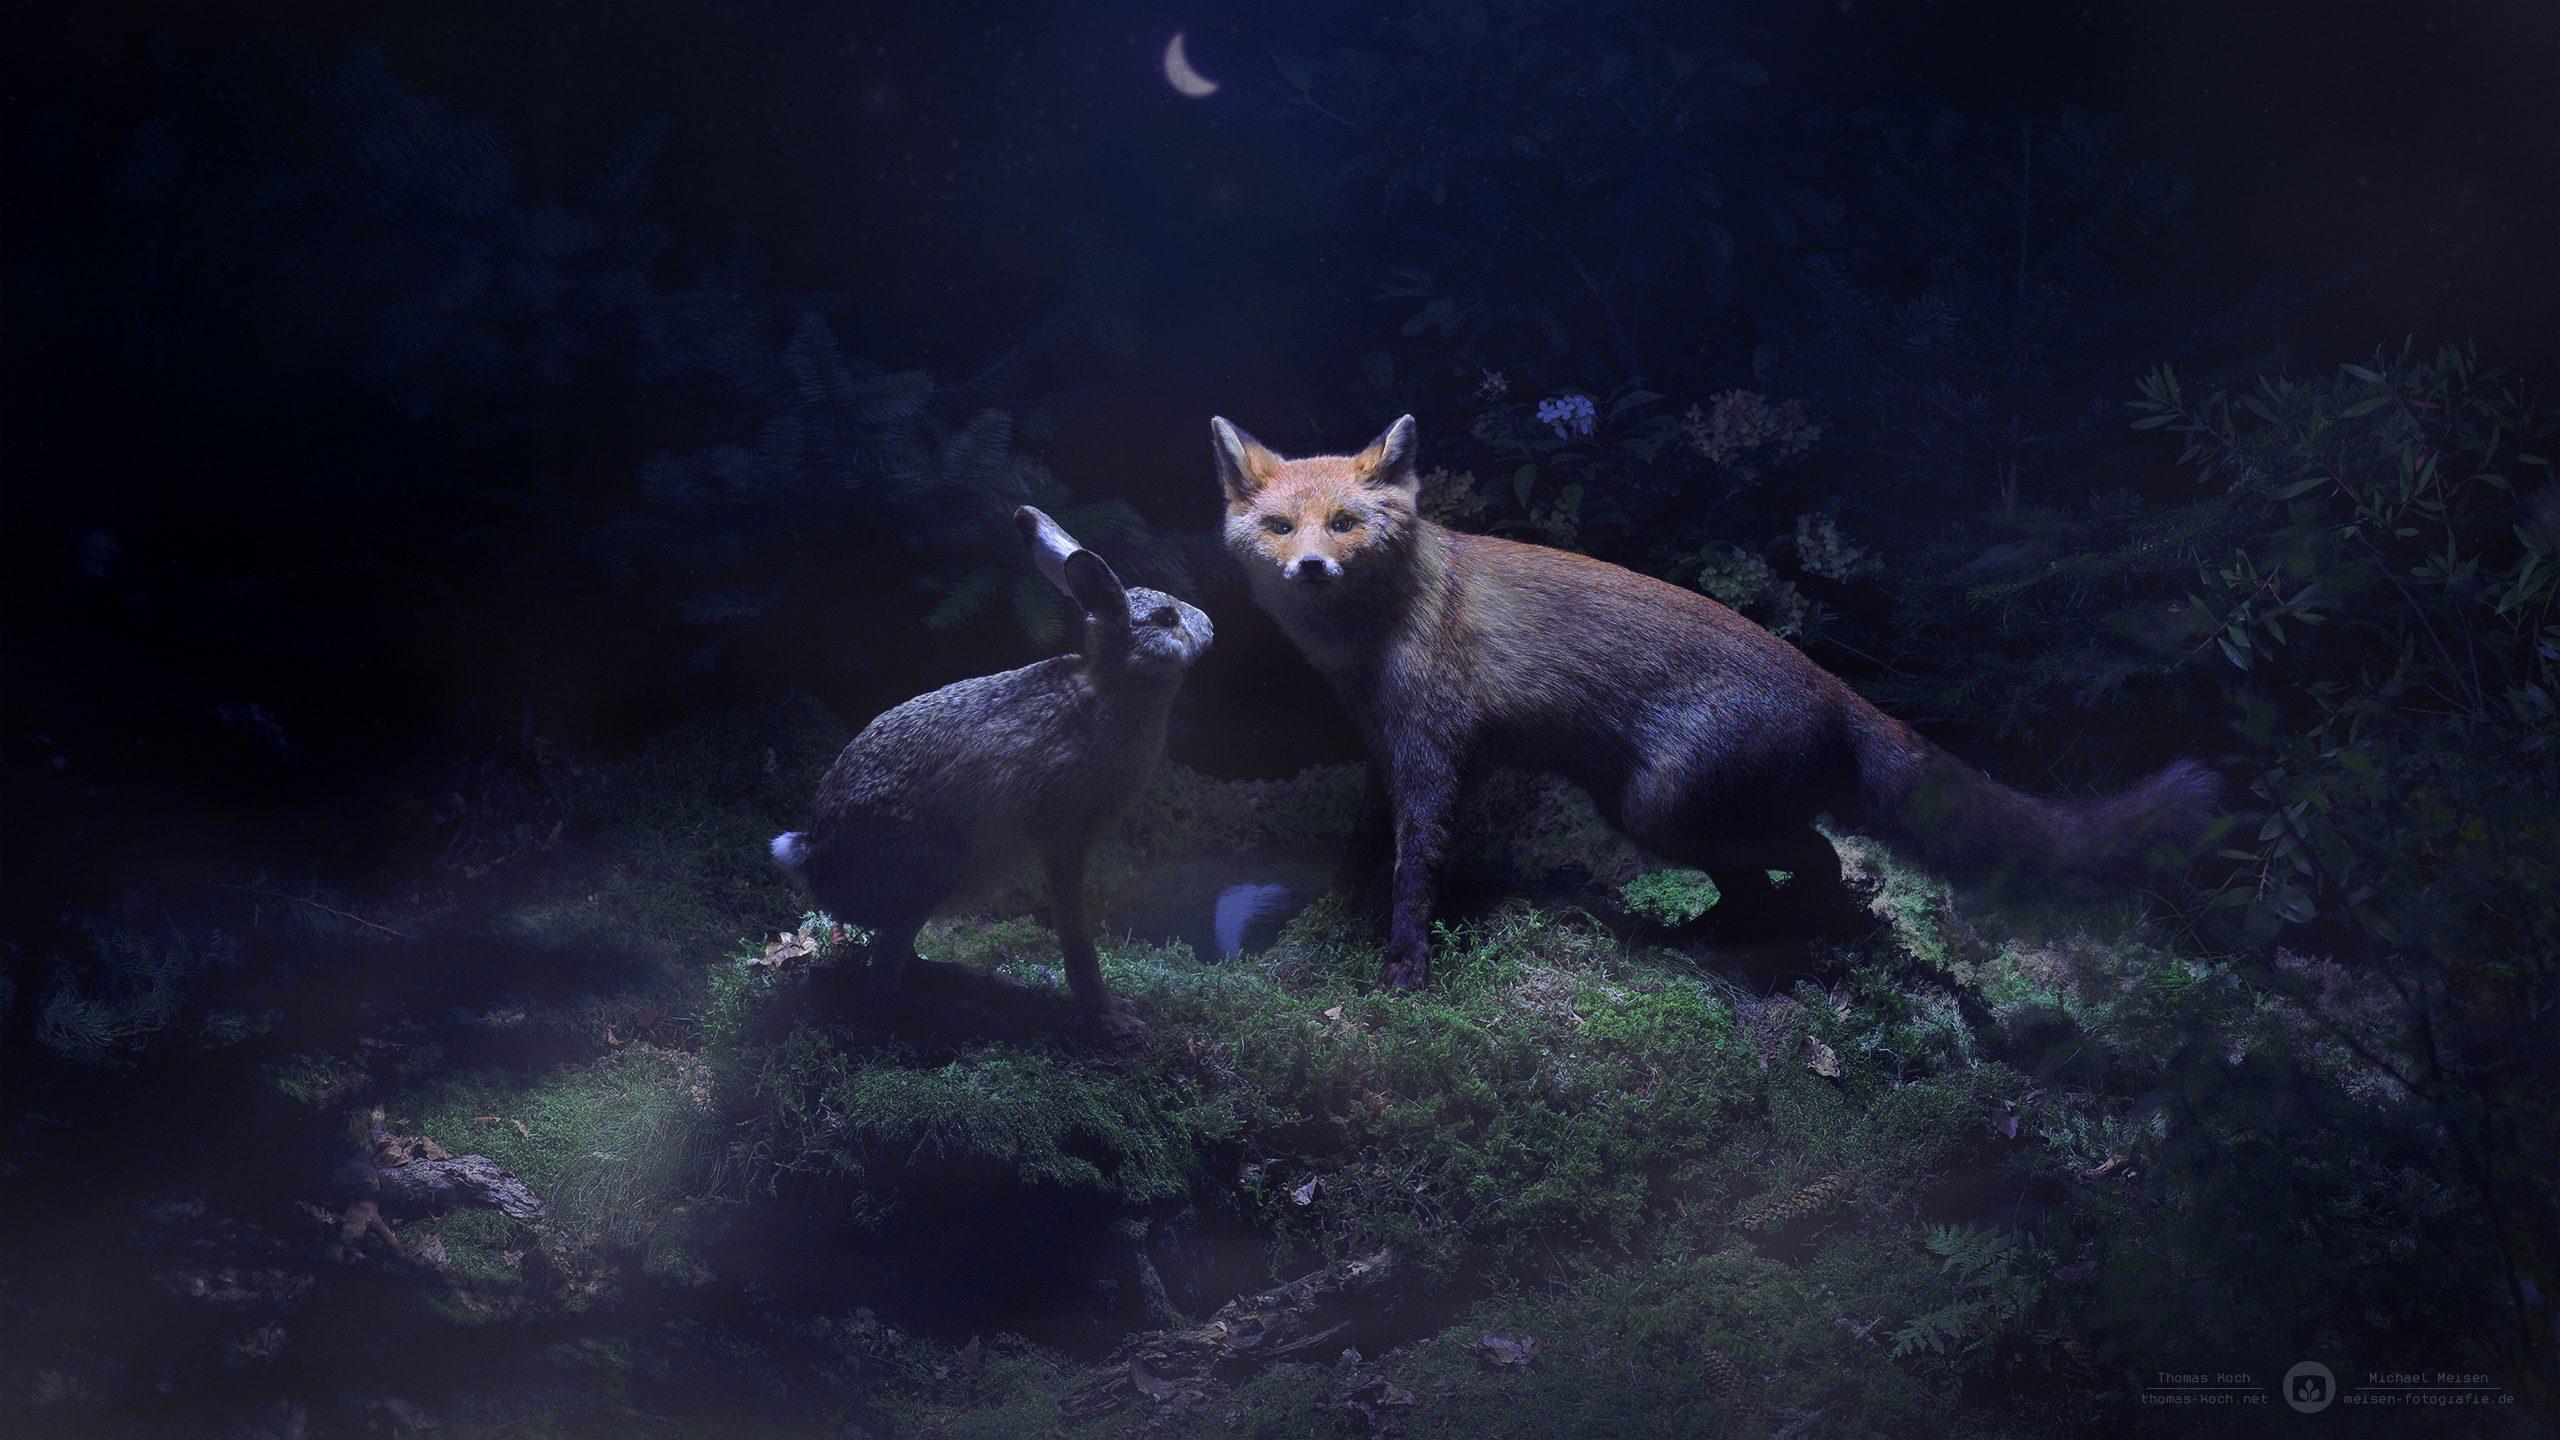 Where Fox Amp Hare Say Goodnight Desktopography